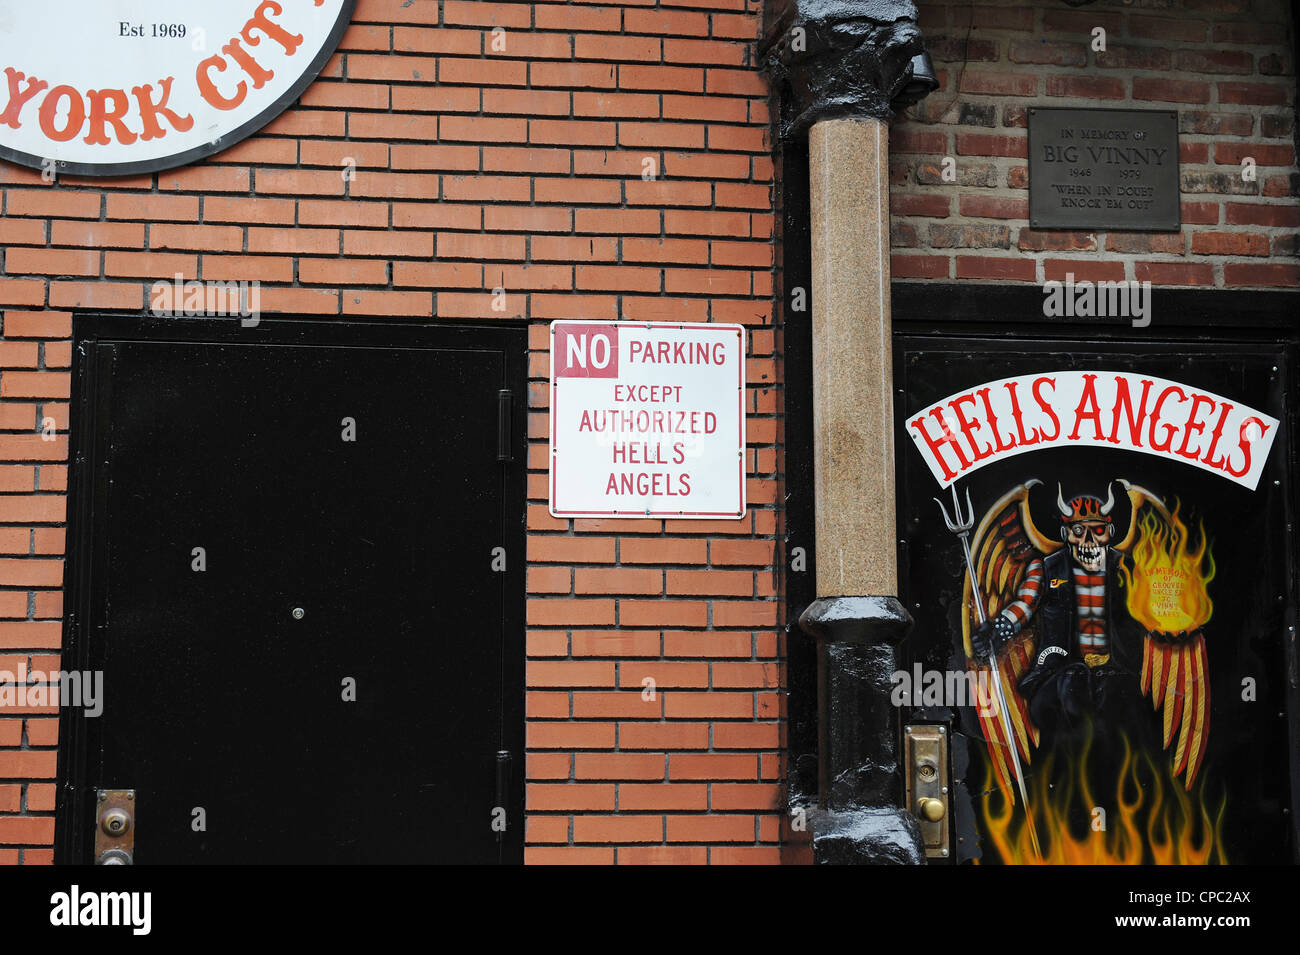 Hells Angels motorcycle club, headquarters East 3rd Street New York - Stock Image